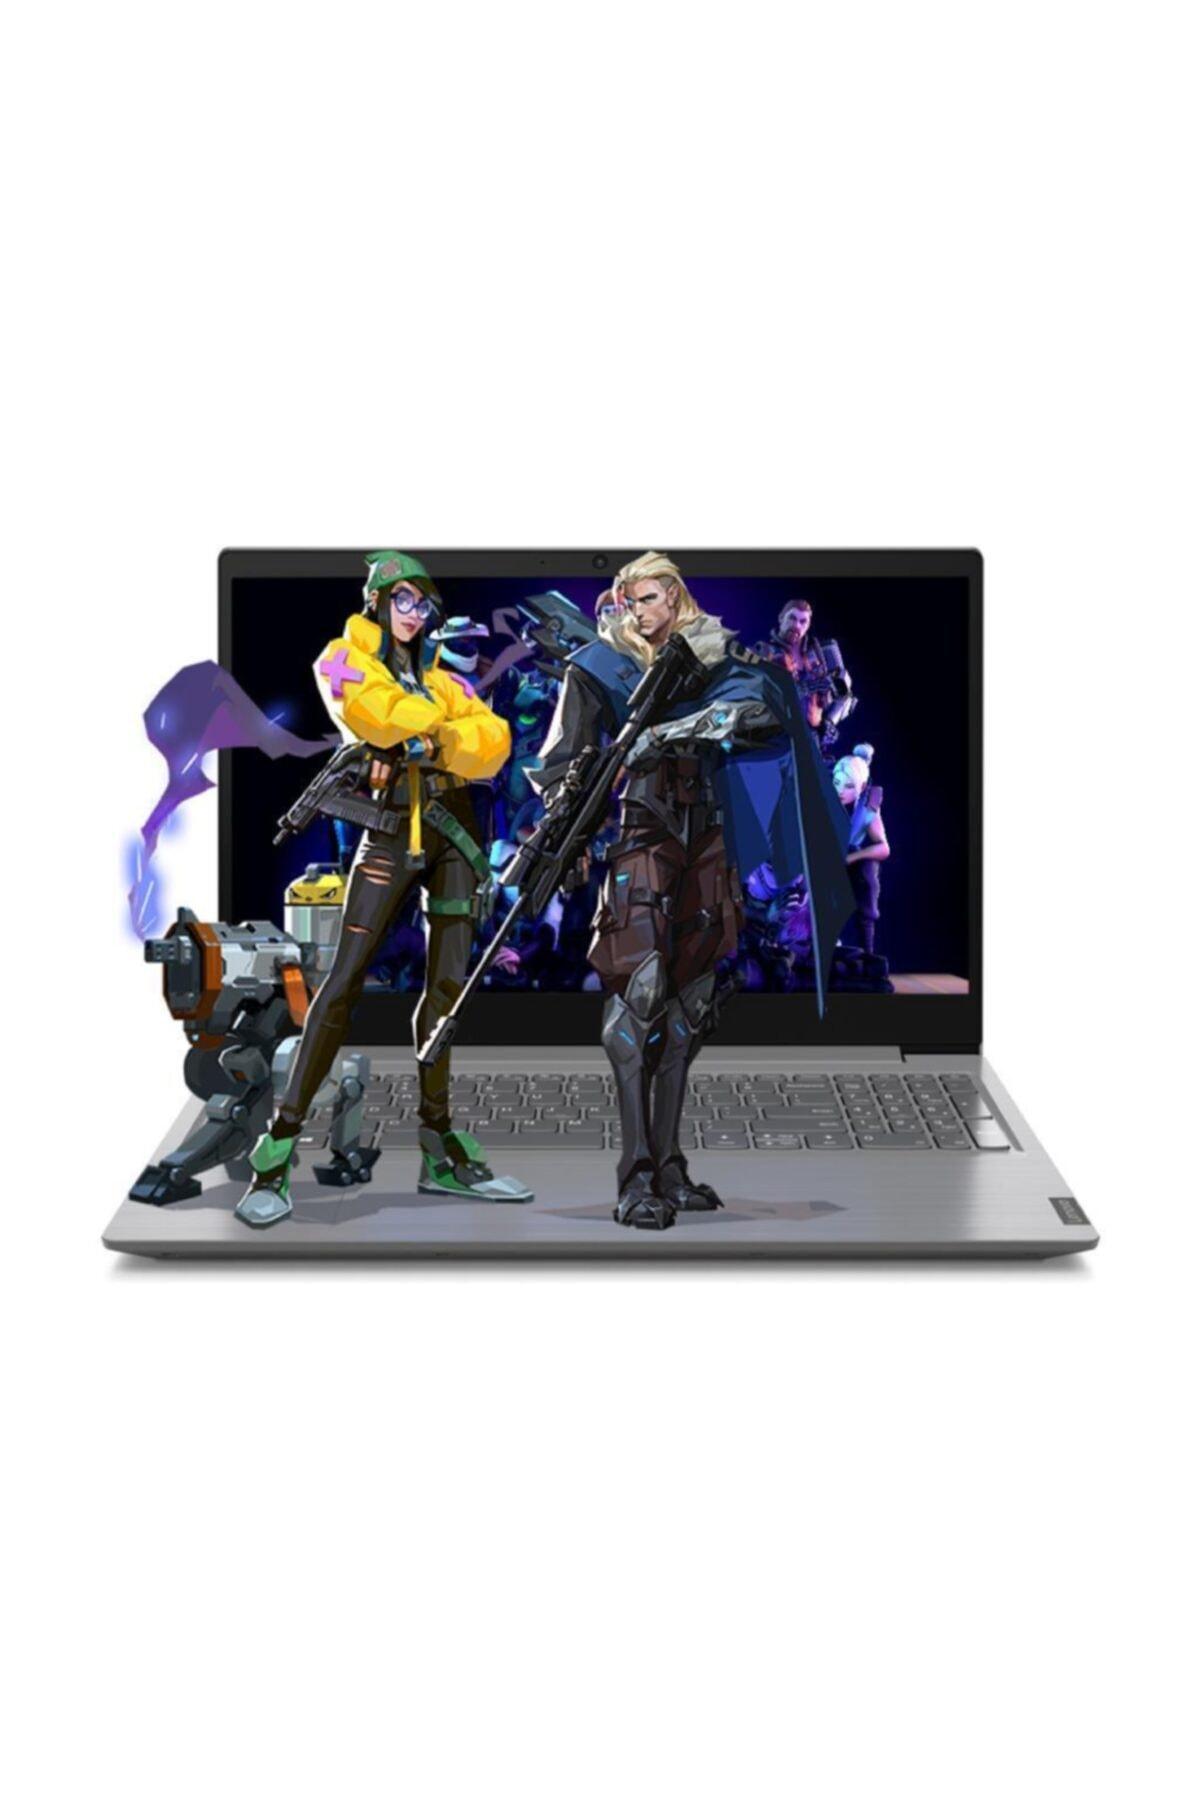 "V15 82c700dltx Amd 3020e 8gb 1tb 15.6"" Fullhd Freedos Taşınabilir Bilgisayar"